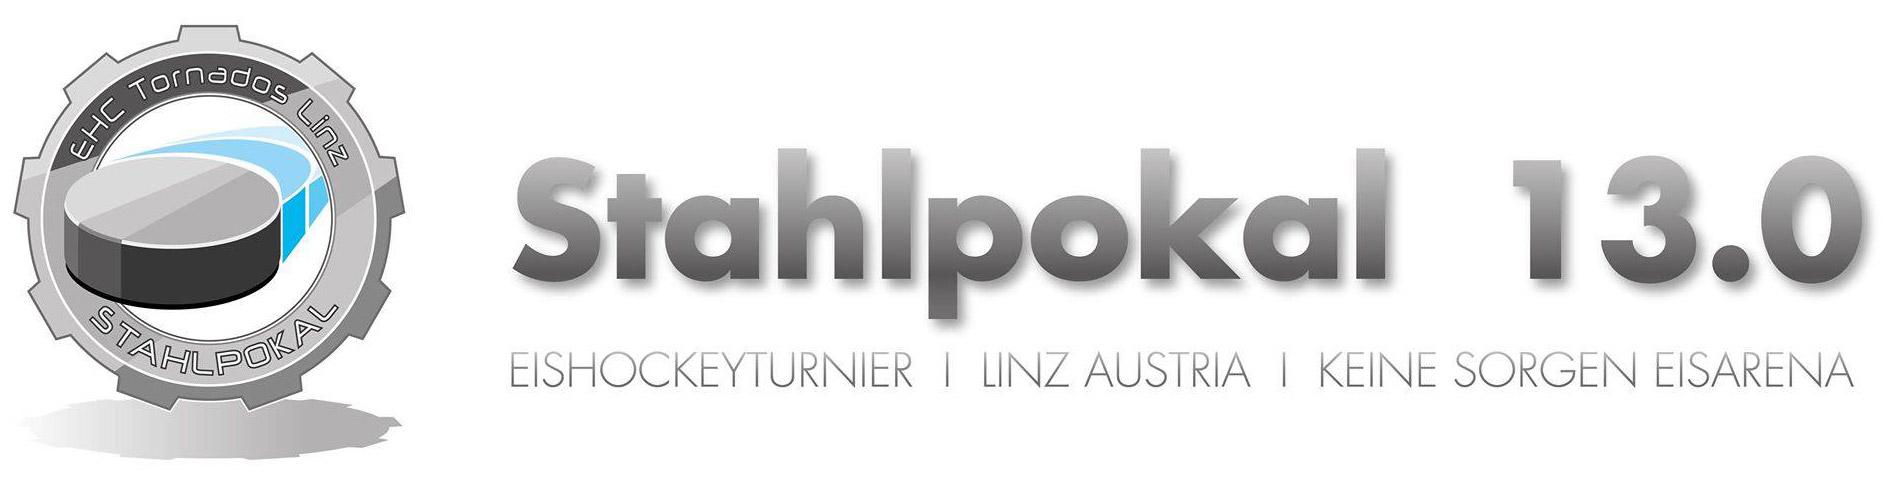 Stahlpokal Linz - Eishockeyturnier